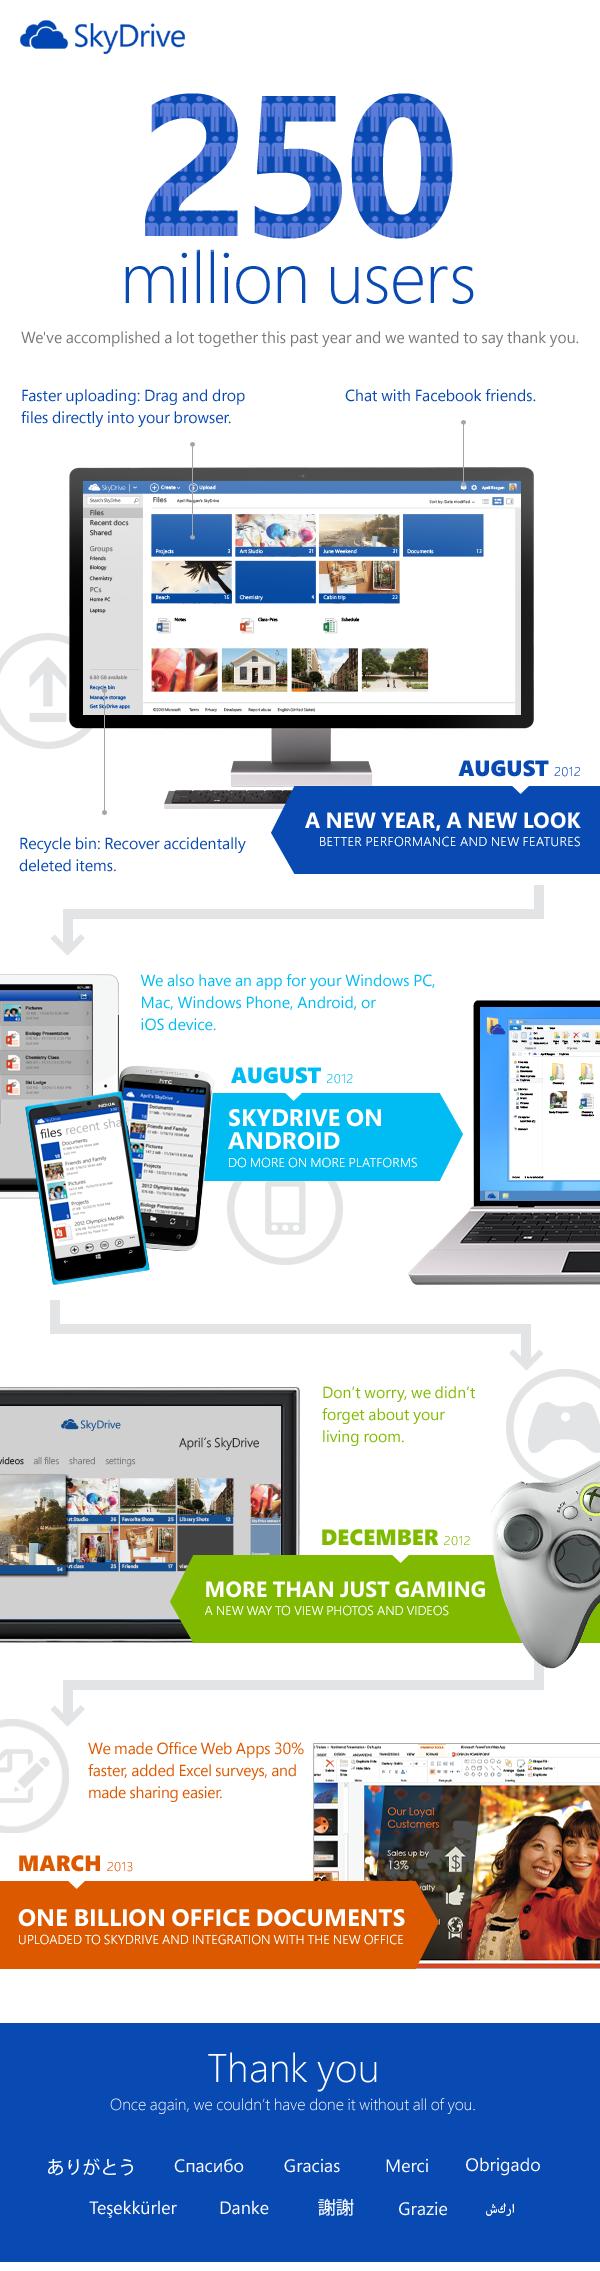 SkyDrive-Anniversary